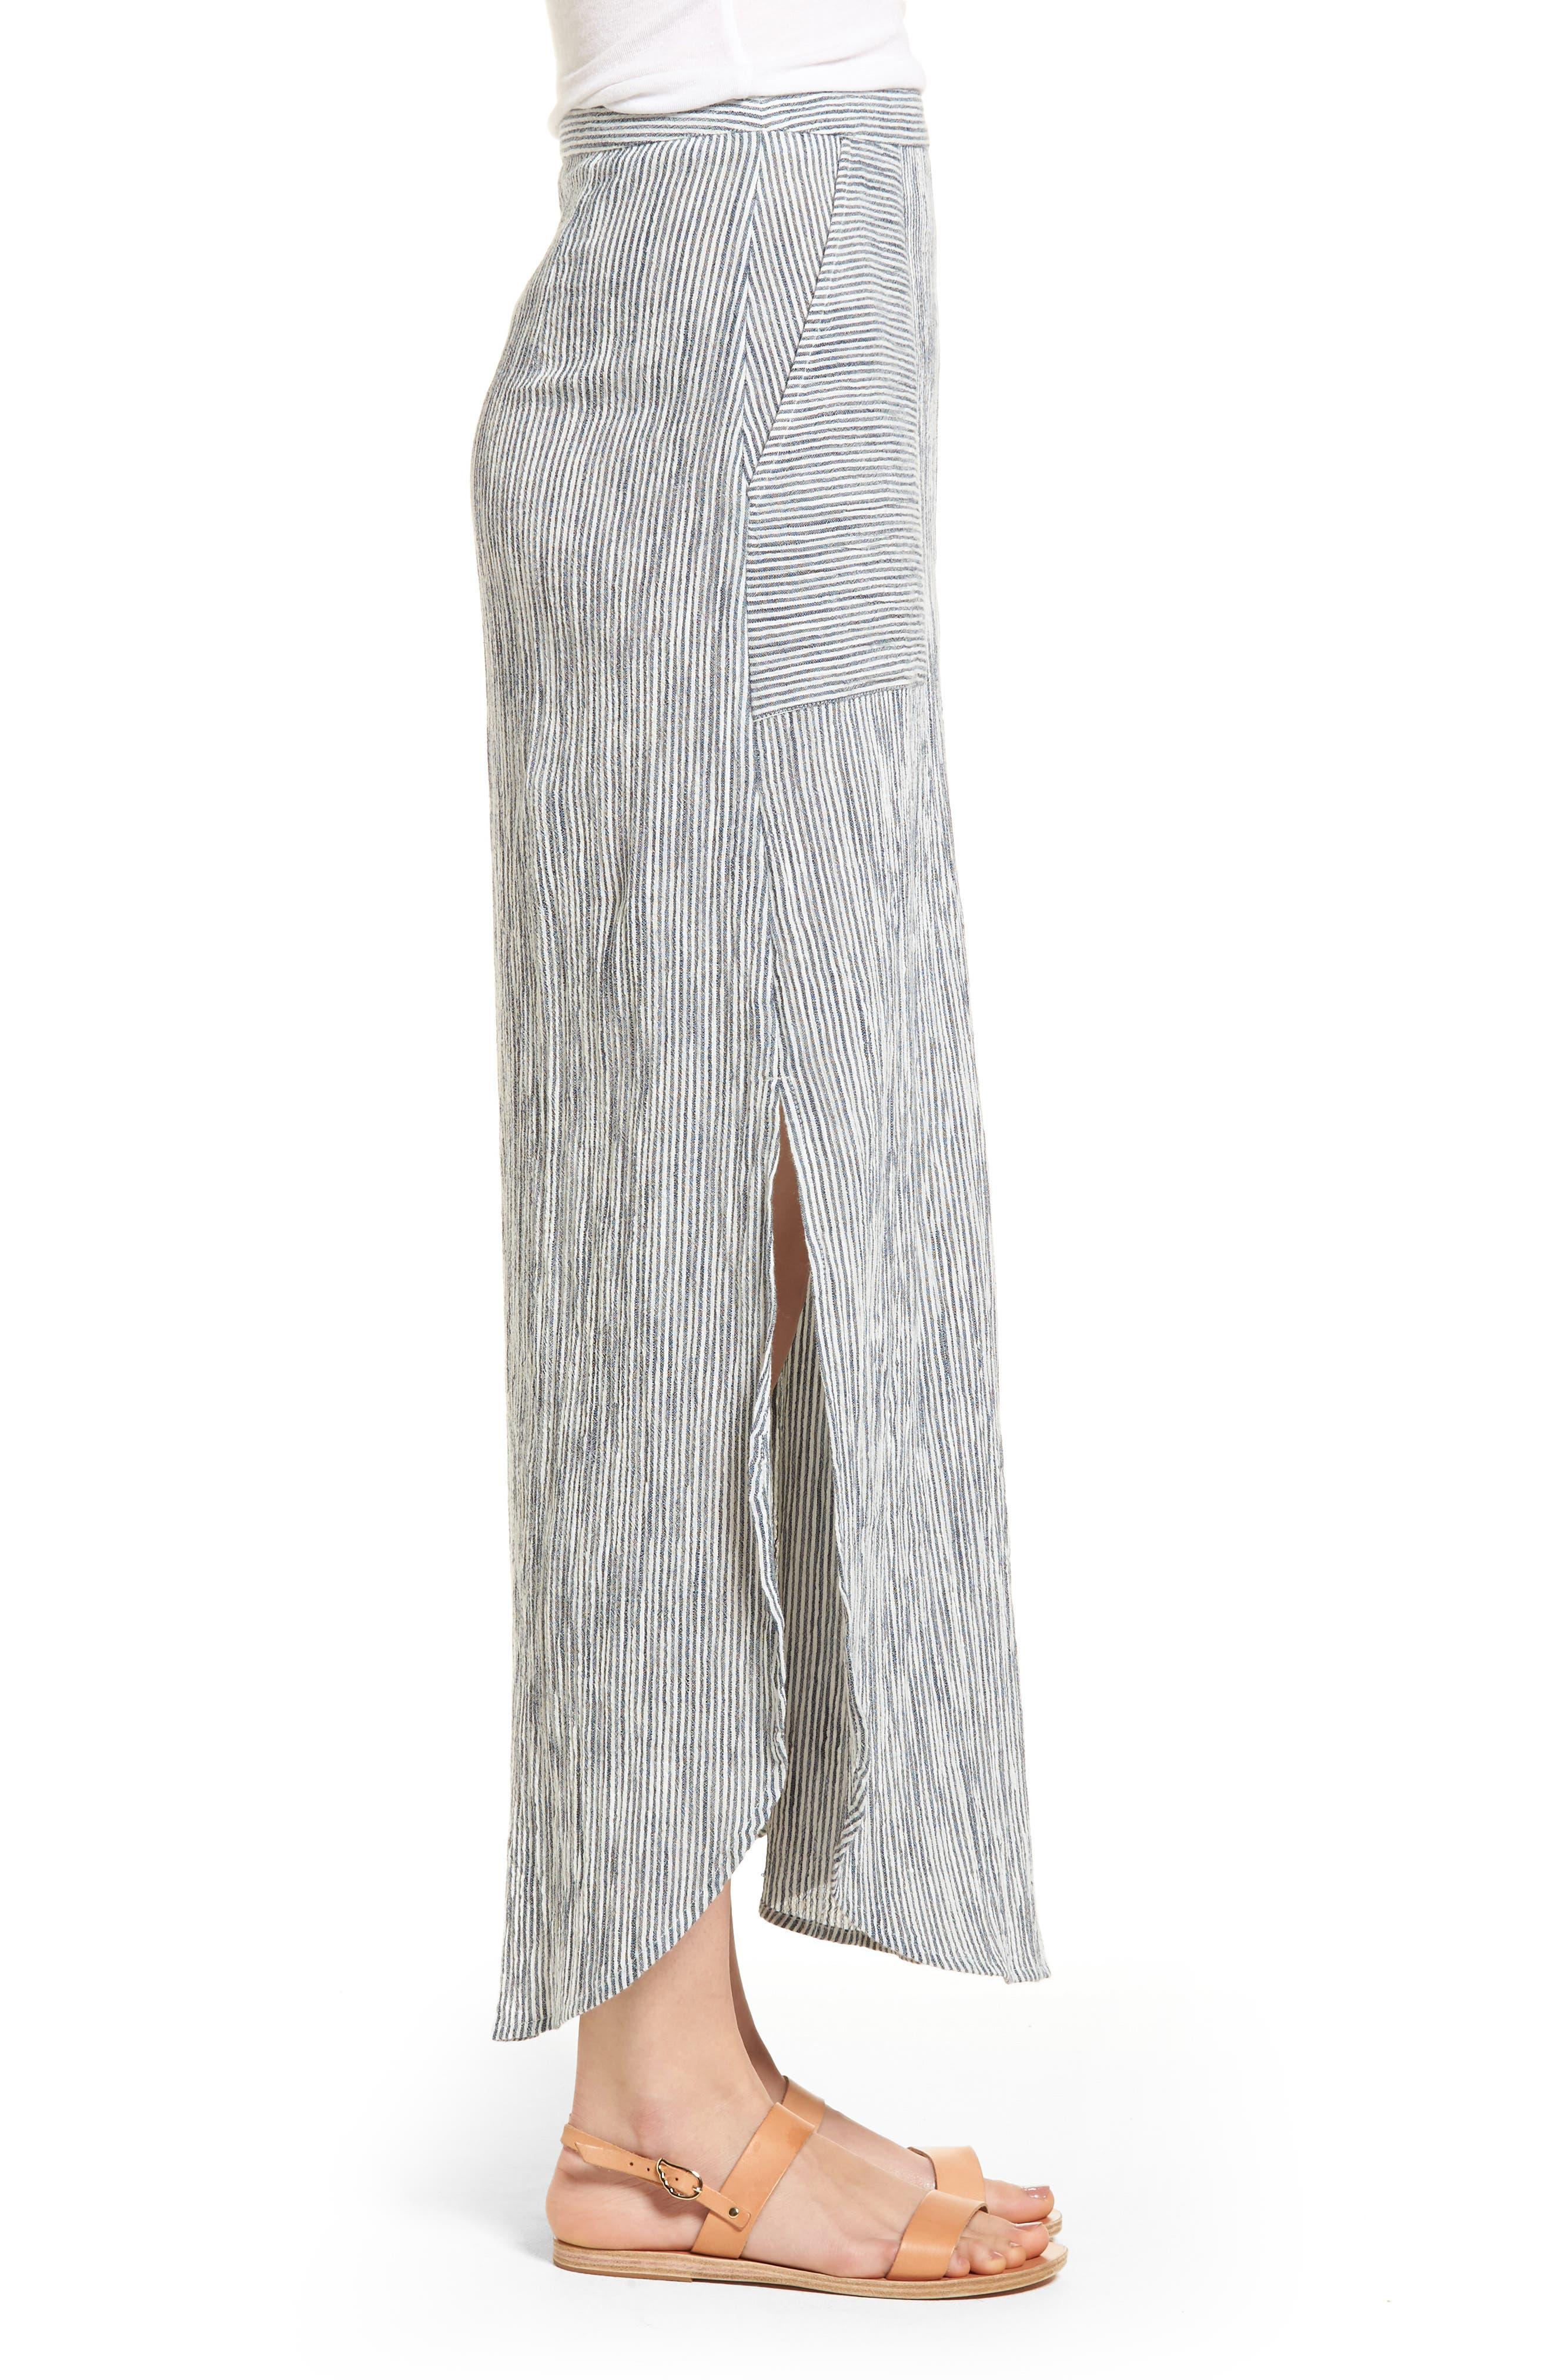 Sunset Islands Pinstripe Maxi Skirt,                             Alternate thumbnail 3, color,